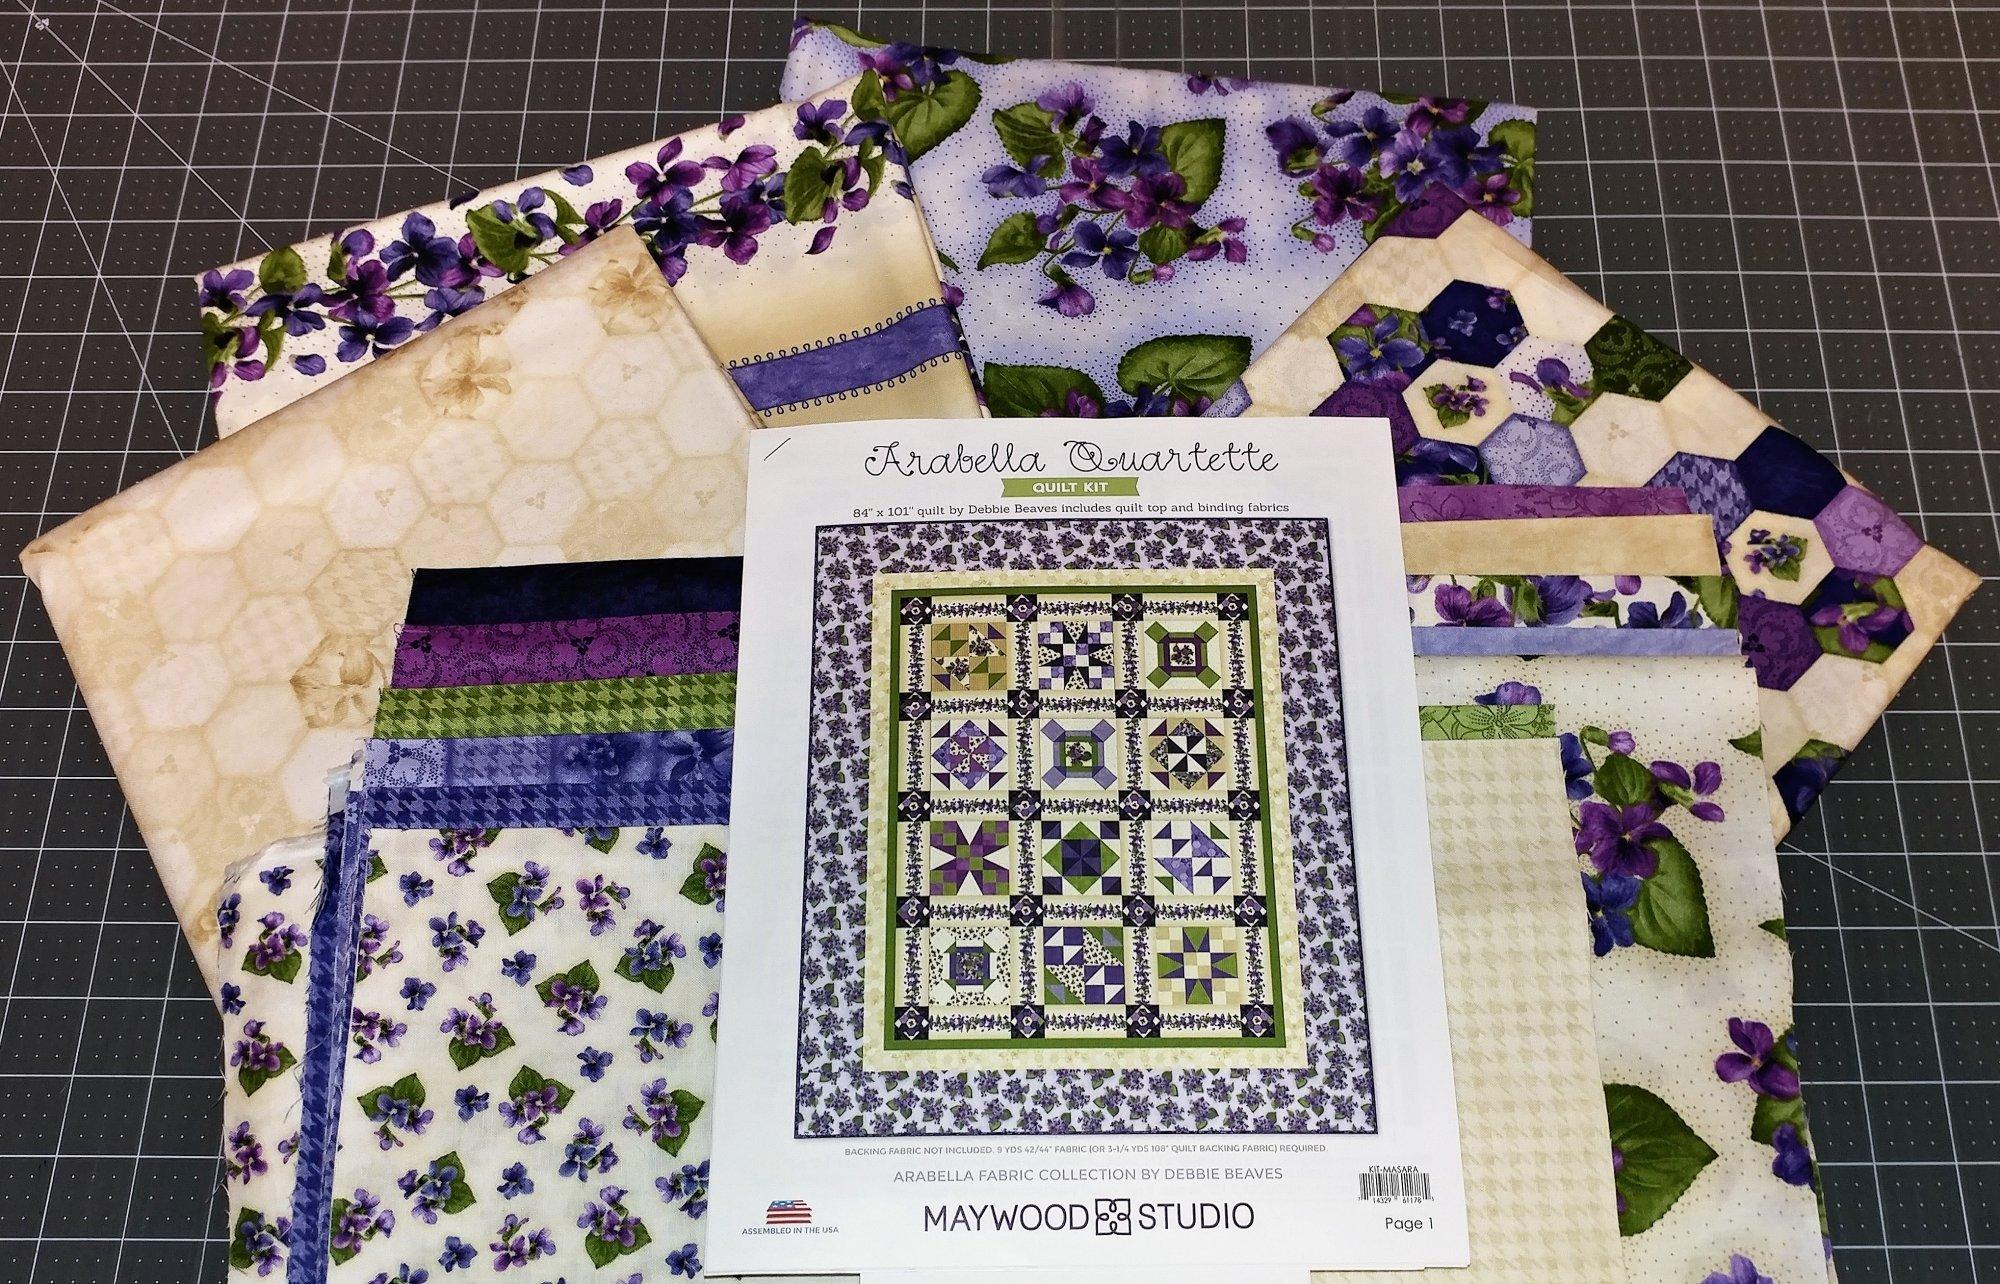 Arabella Quartette Fabric Kit, Fabric and Pattern by Debbie Beaves for Maywood Studio : Kit-Masara